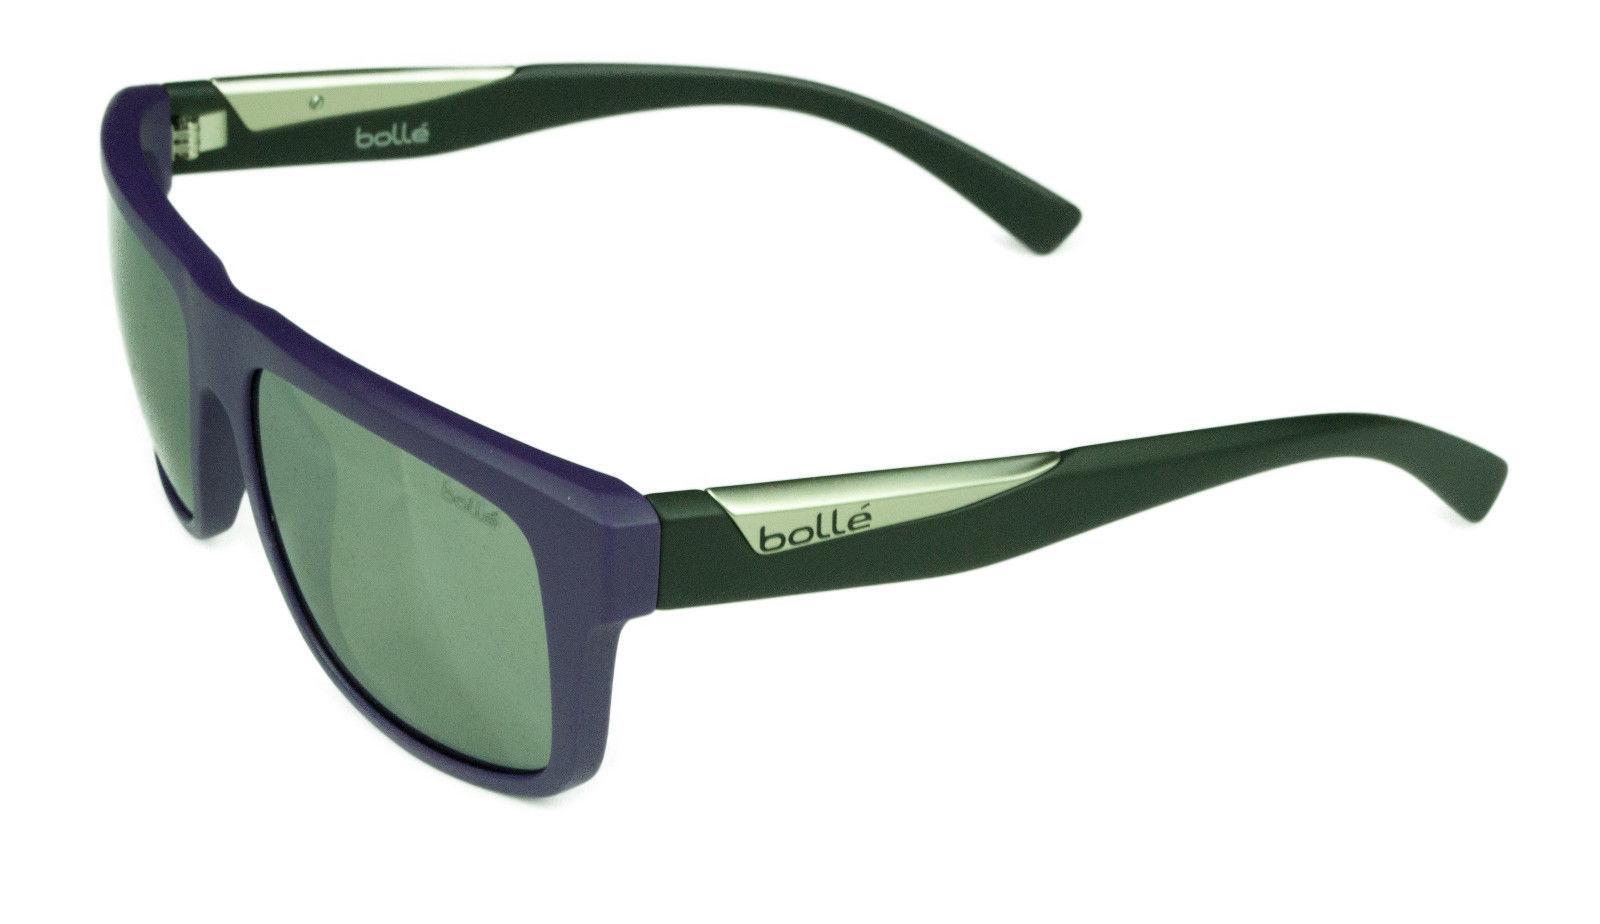 a34cdb32a4b New Bolle Clint Sunglasses - 11920 - and 50 similar items